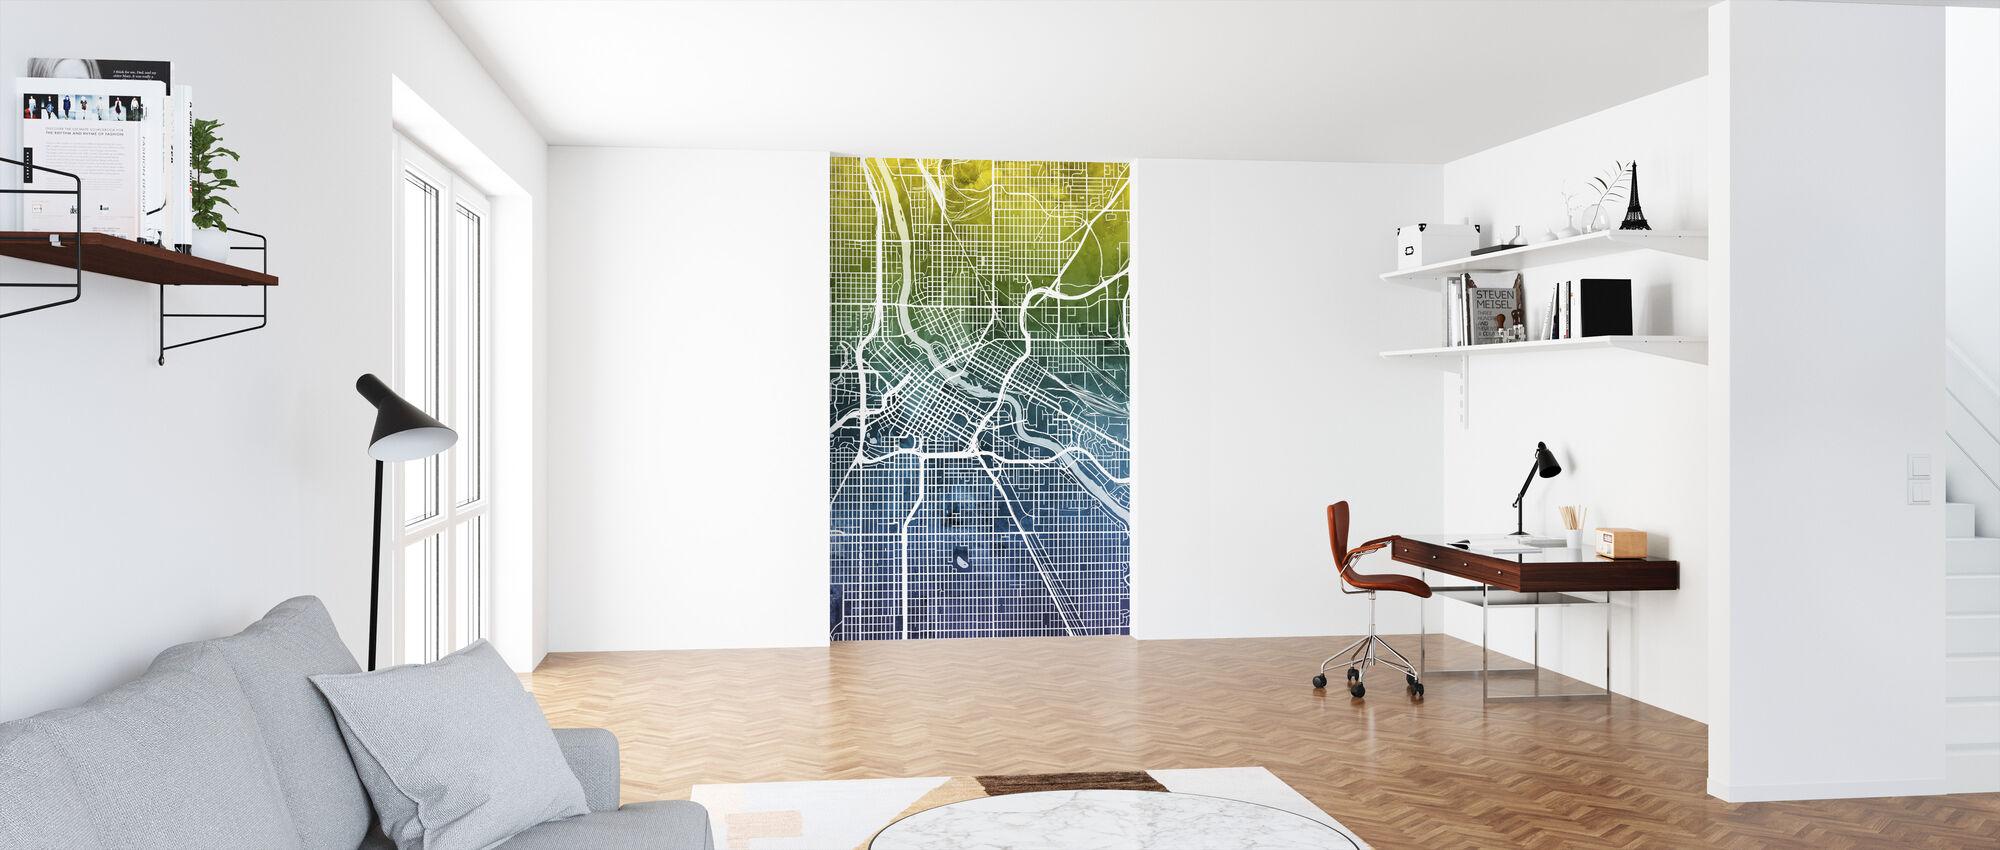 Minneapolis Minnesota City Kaart - Behang - Kantoor